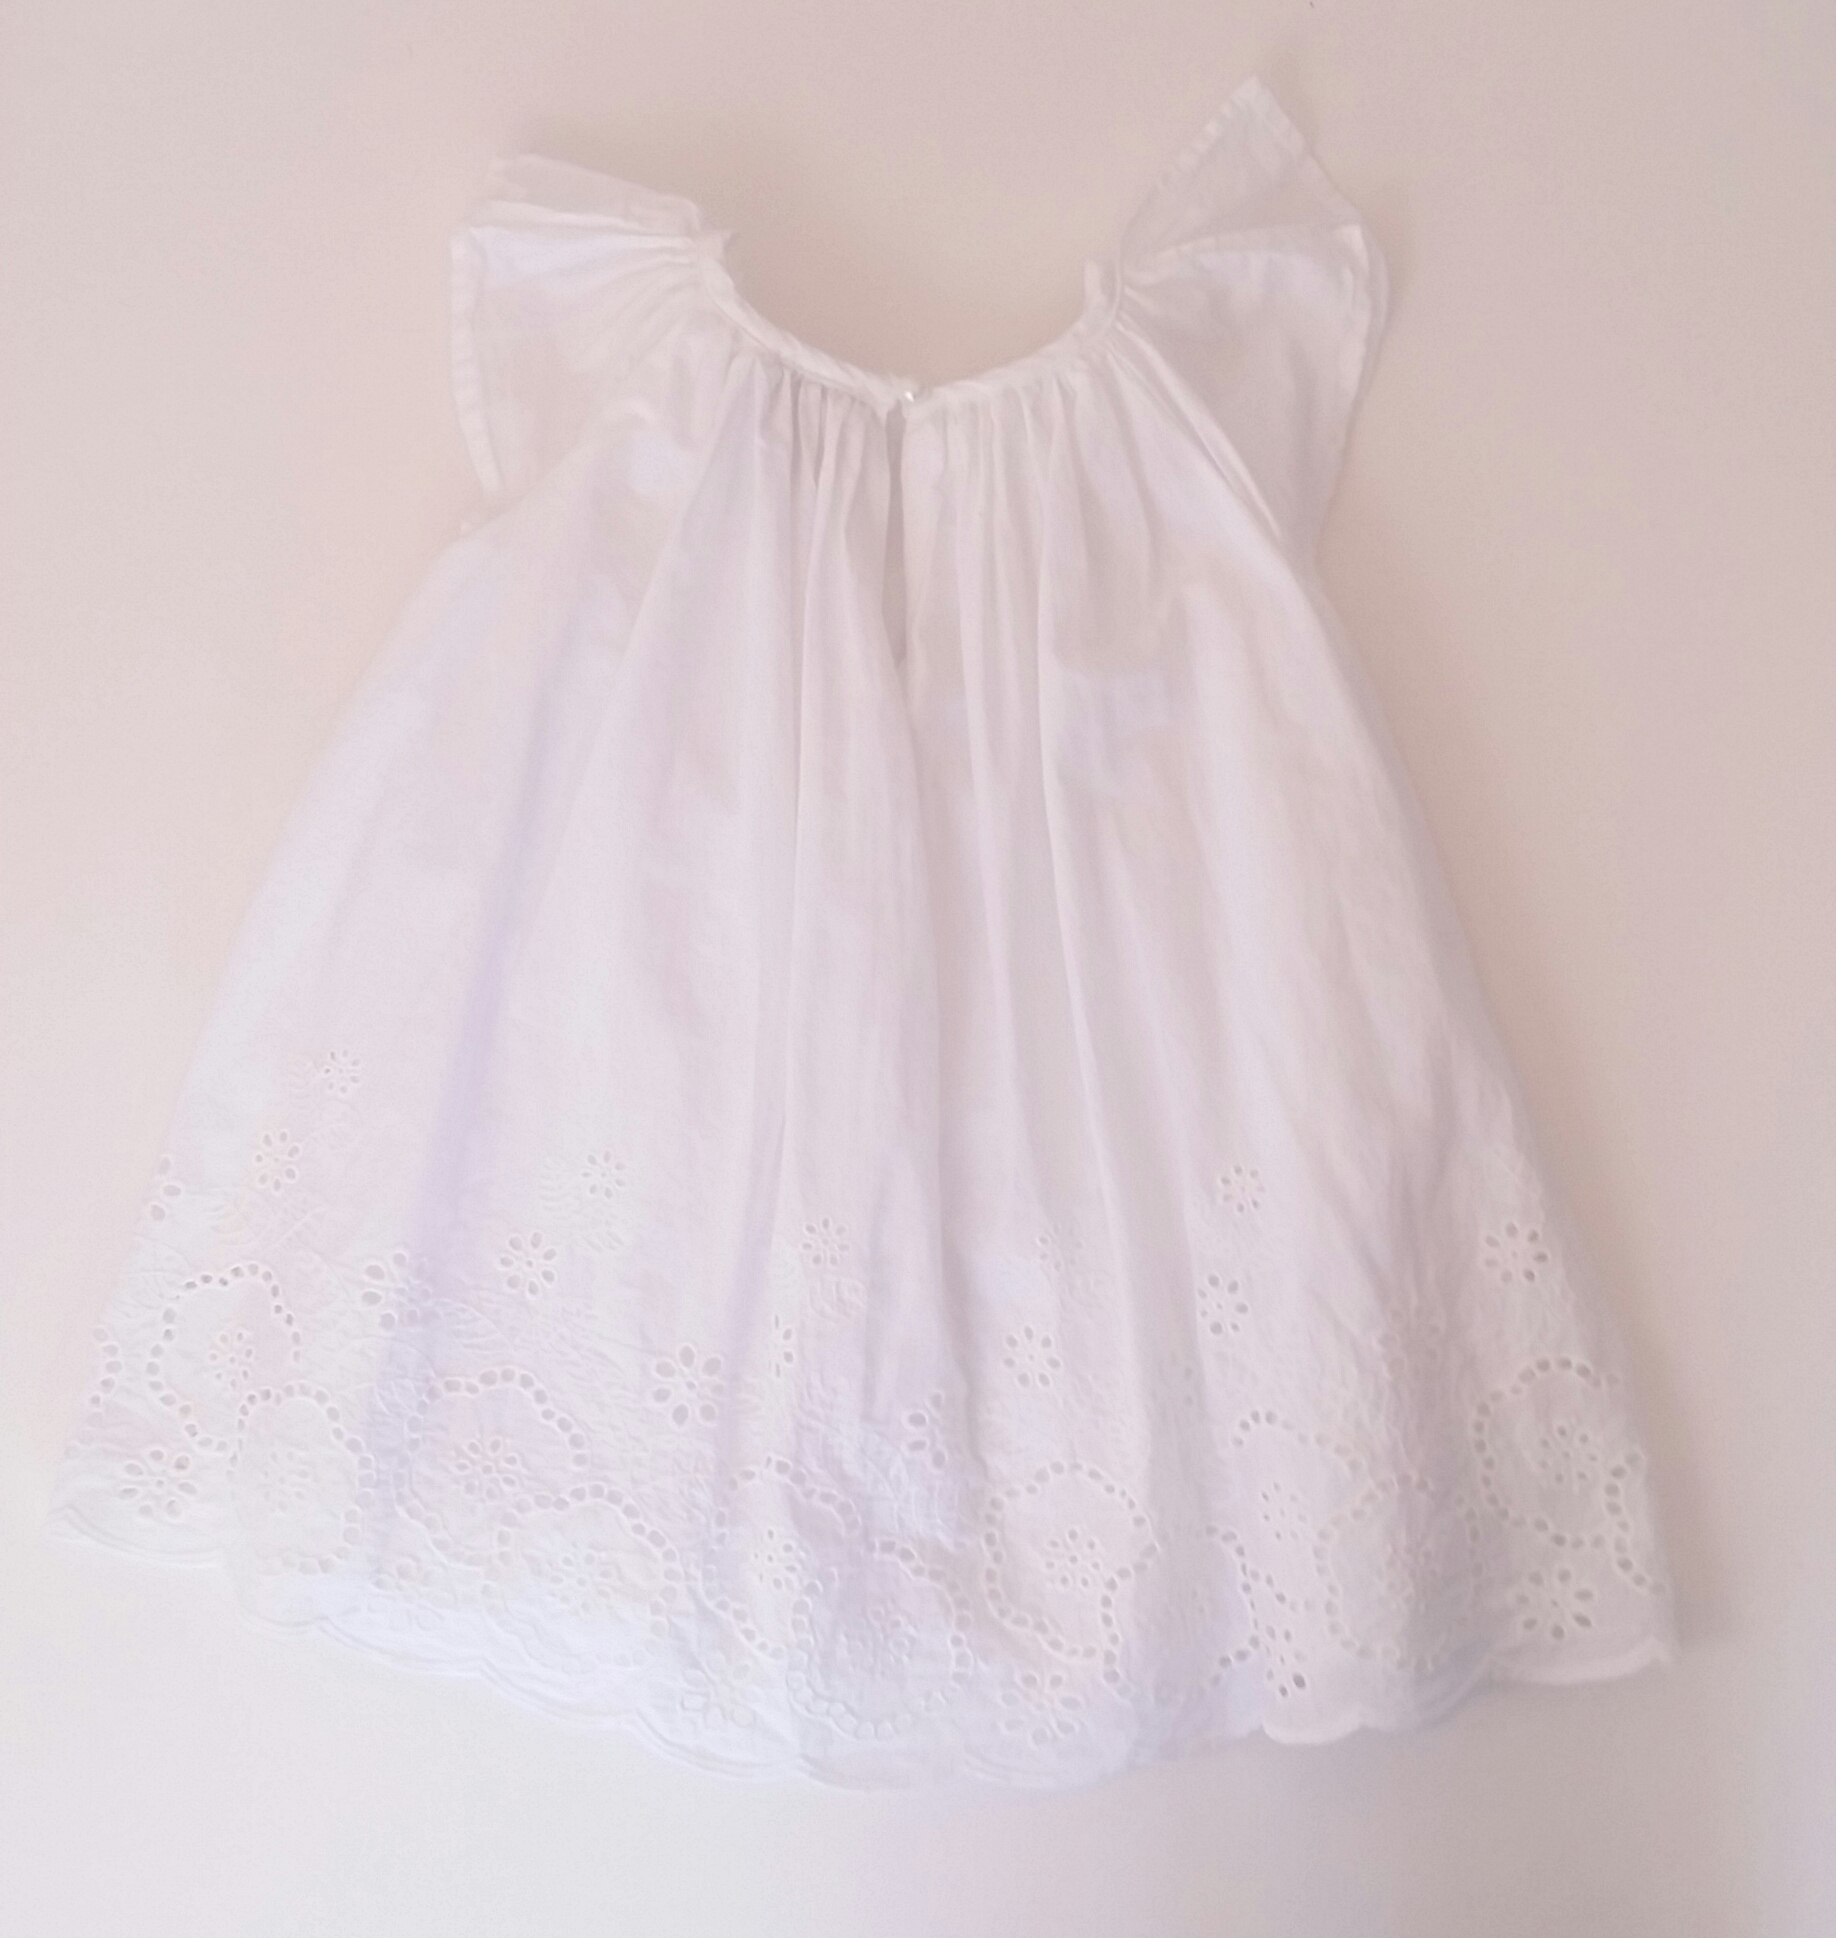 Elie-Tahari-18-24-MONTHS-Eyelet-Dress_2191686A.jpg